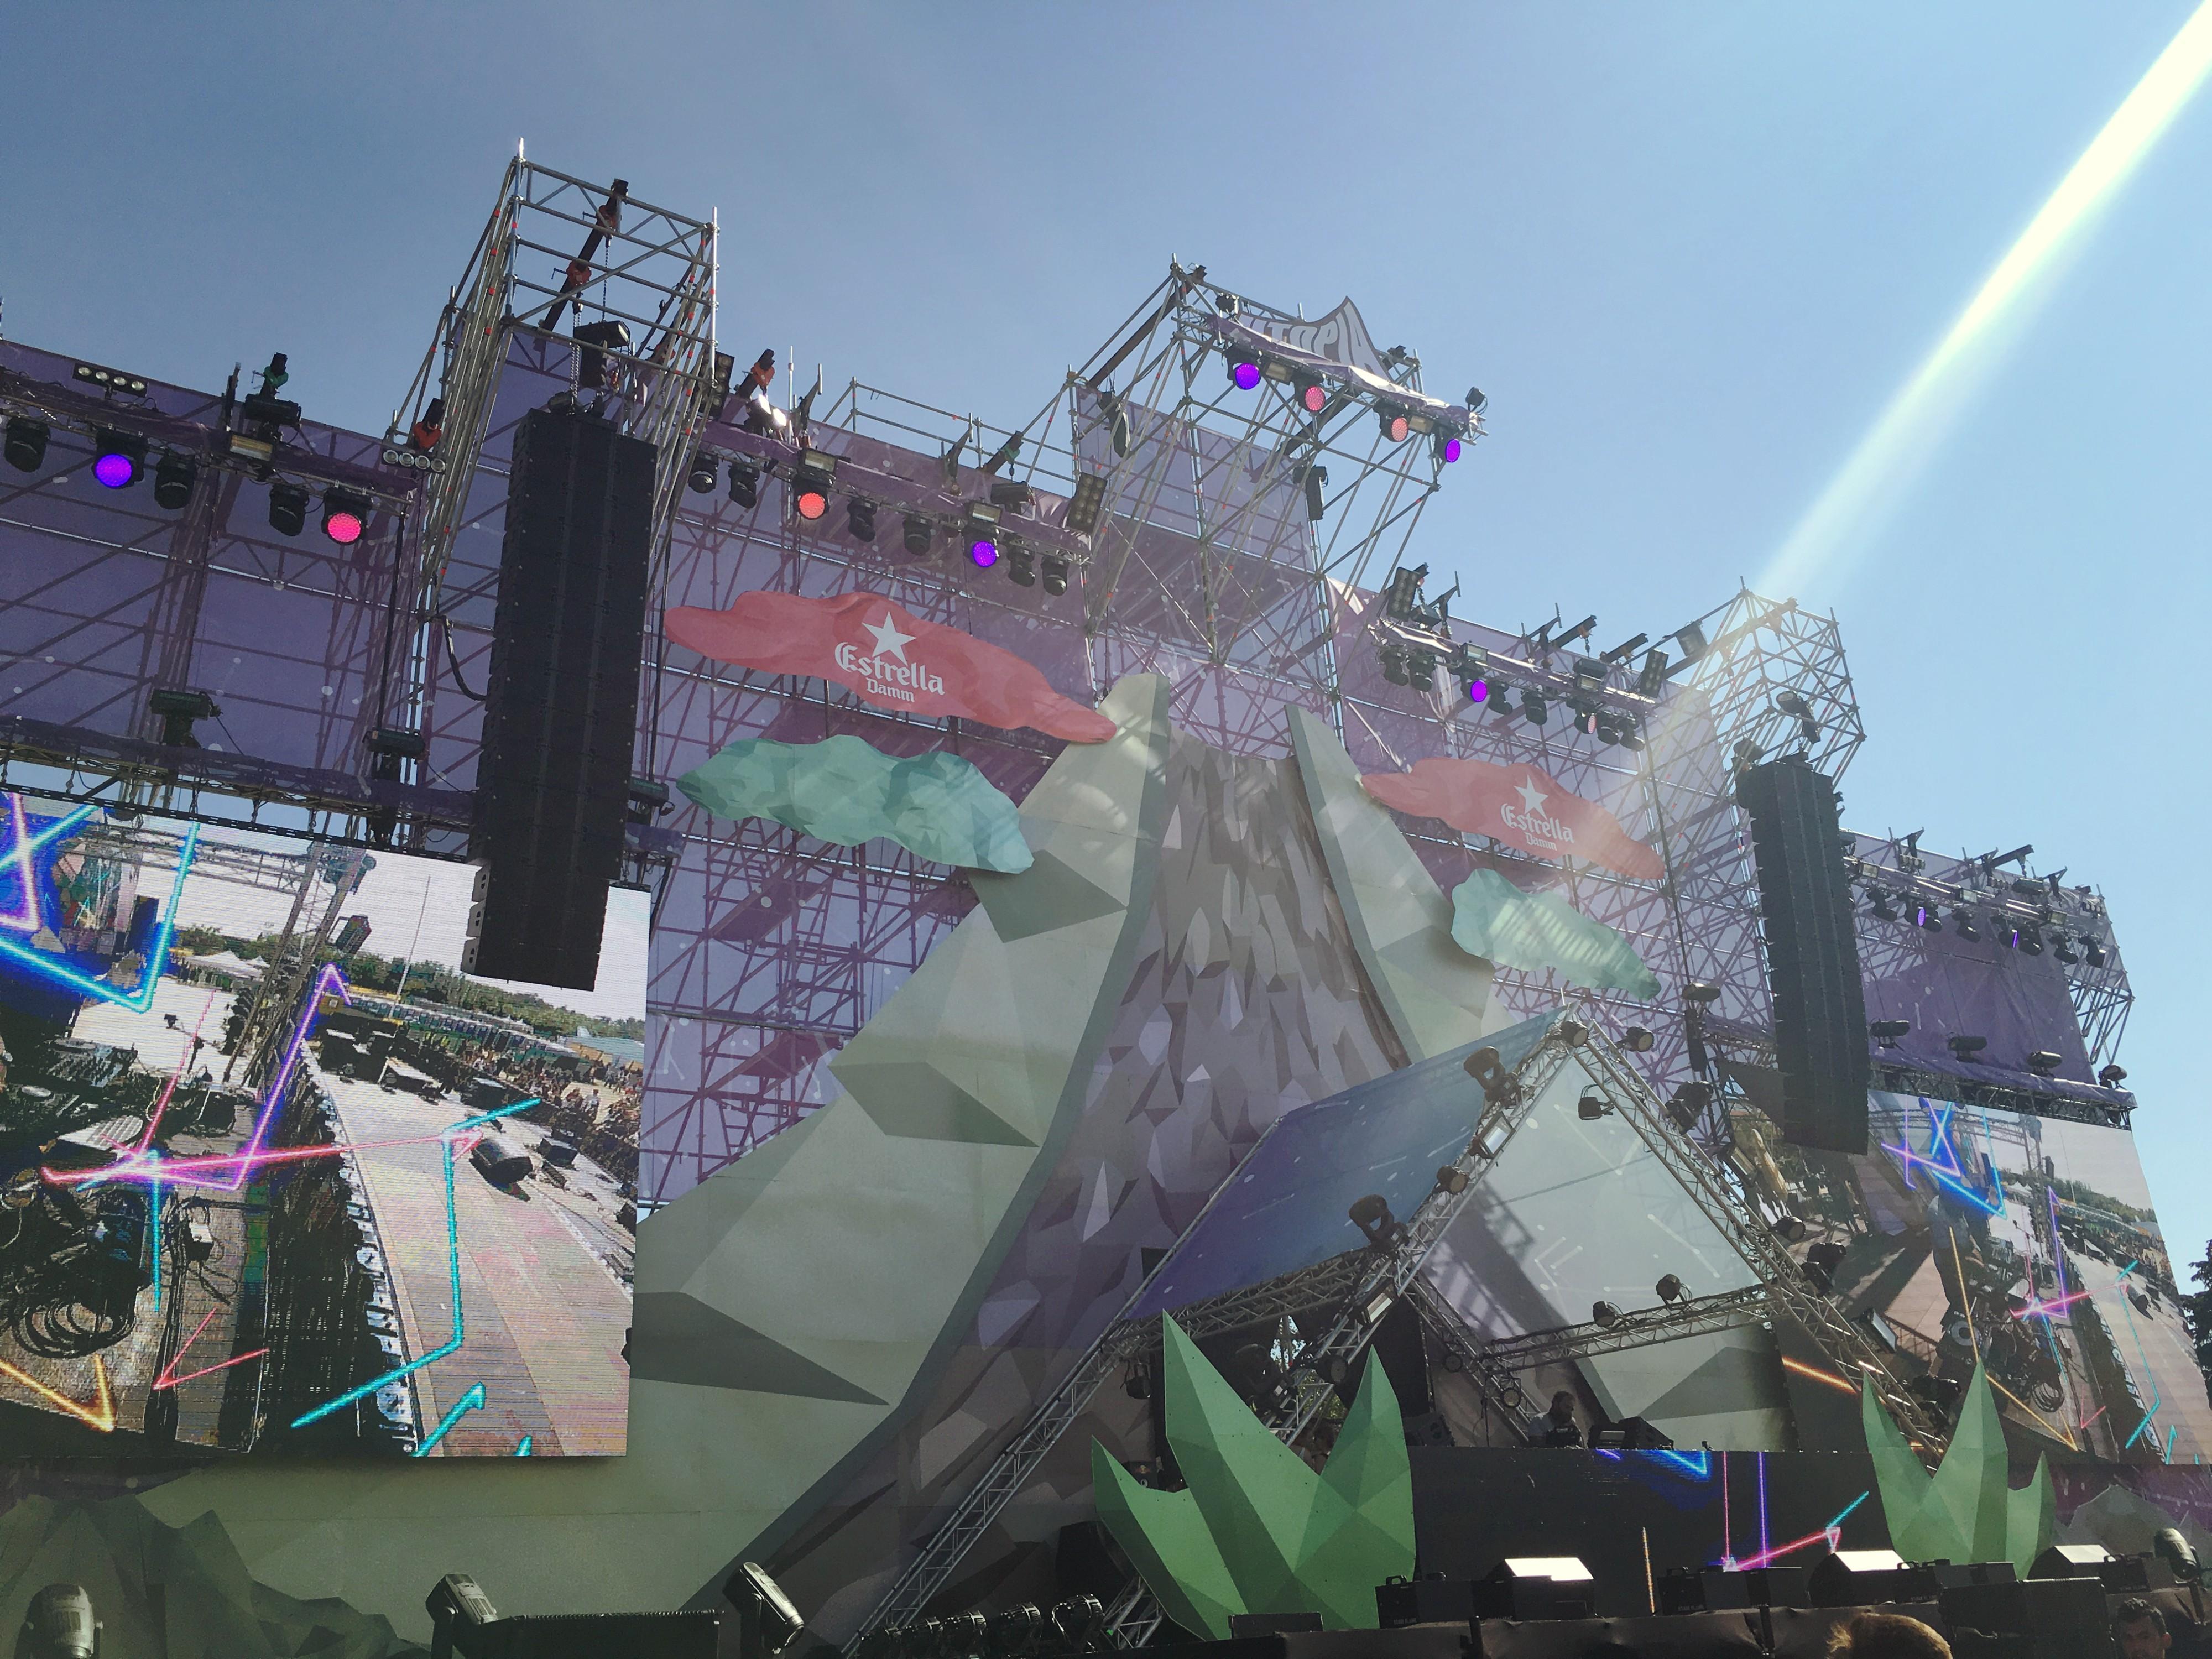 Festival utop a madrid piensa en chic - Utopia madrid ...